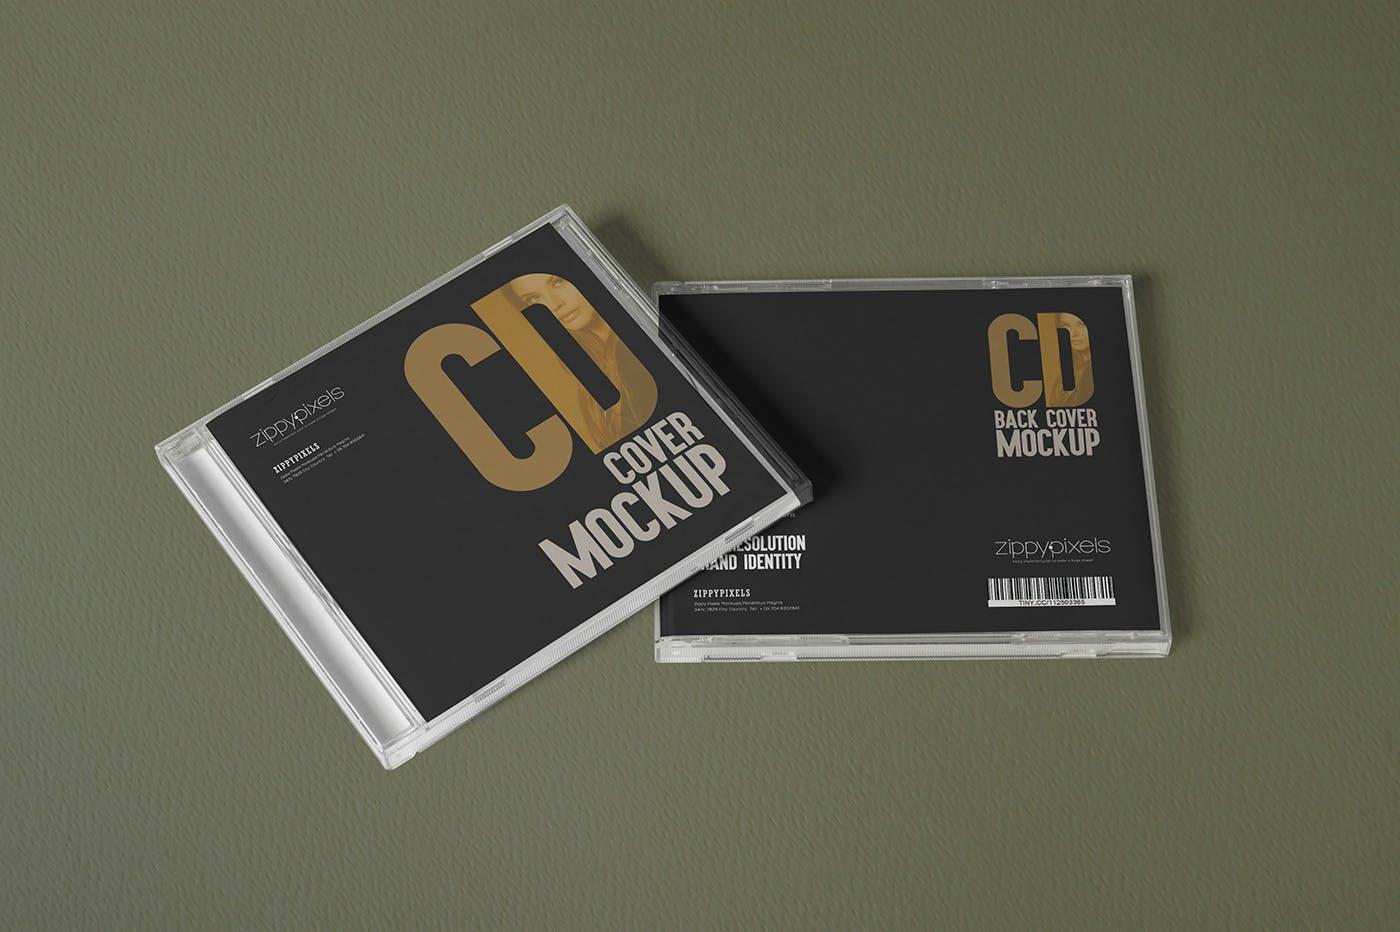 高端唱片样机素材场景素材模板6 CD Cover Mockups